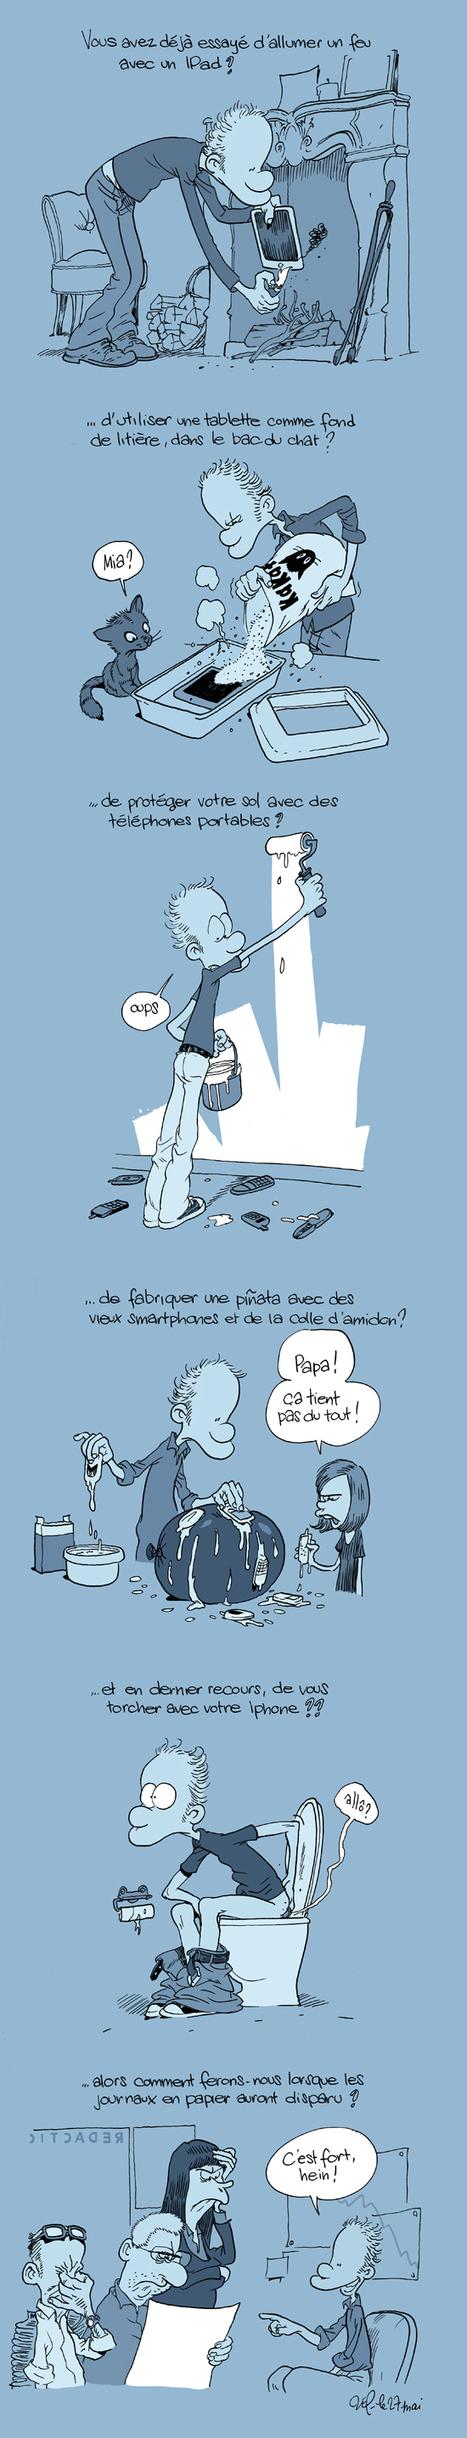 Futur | Contenu pour mon Blog | Scoop.it